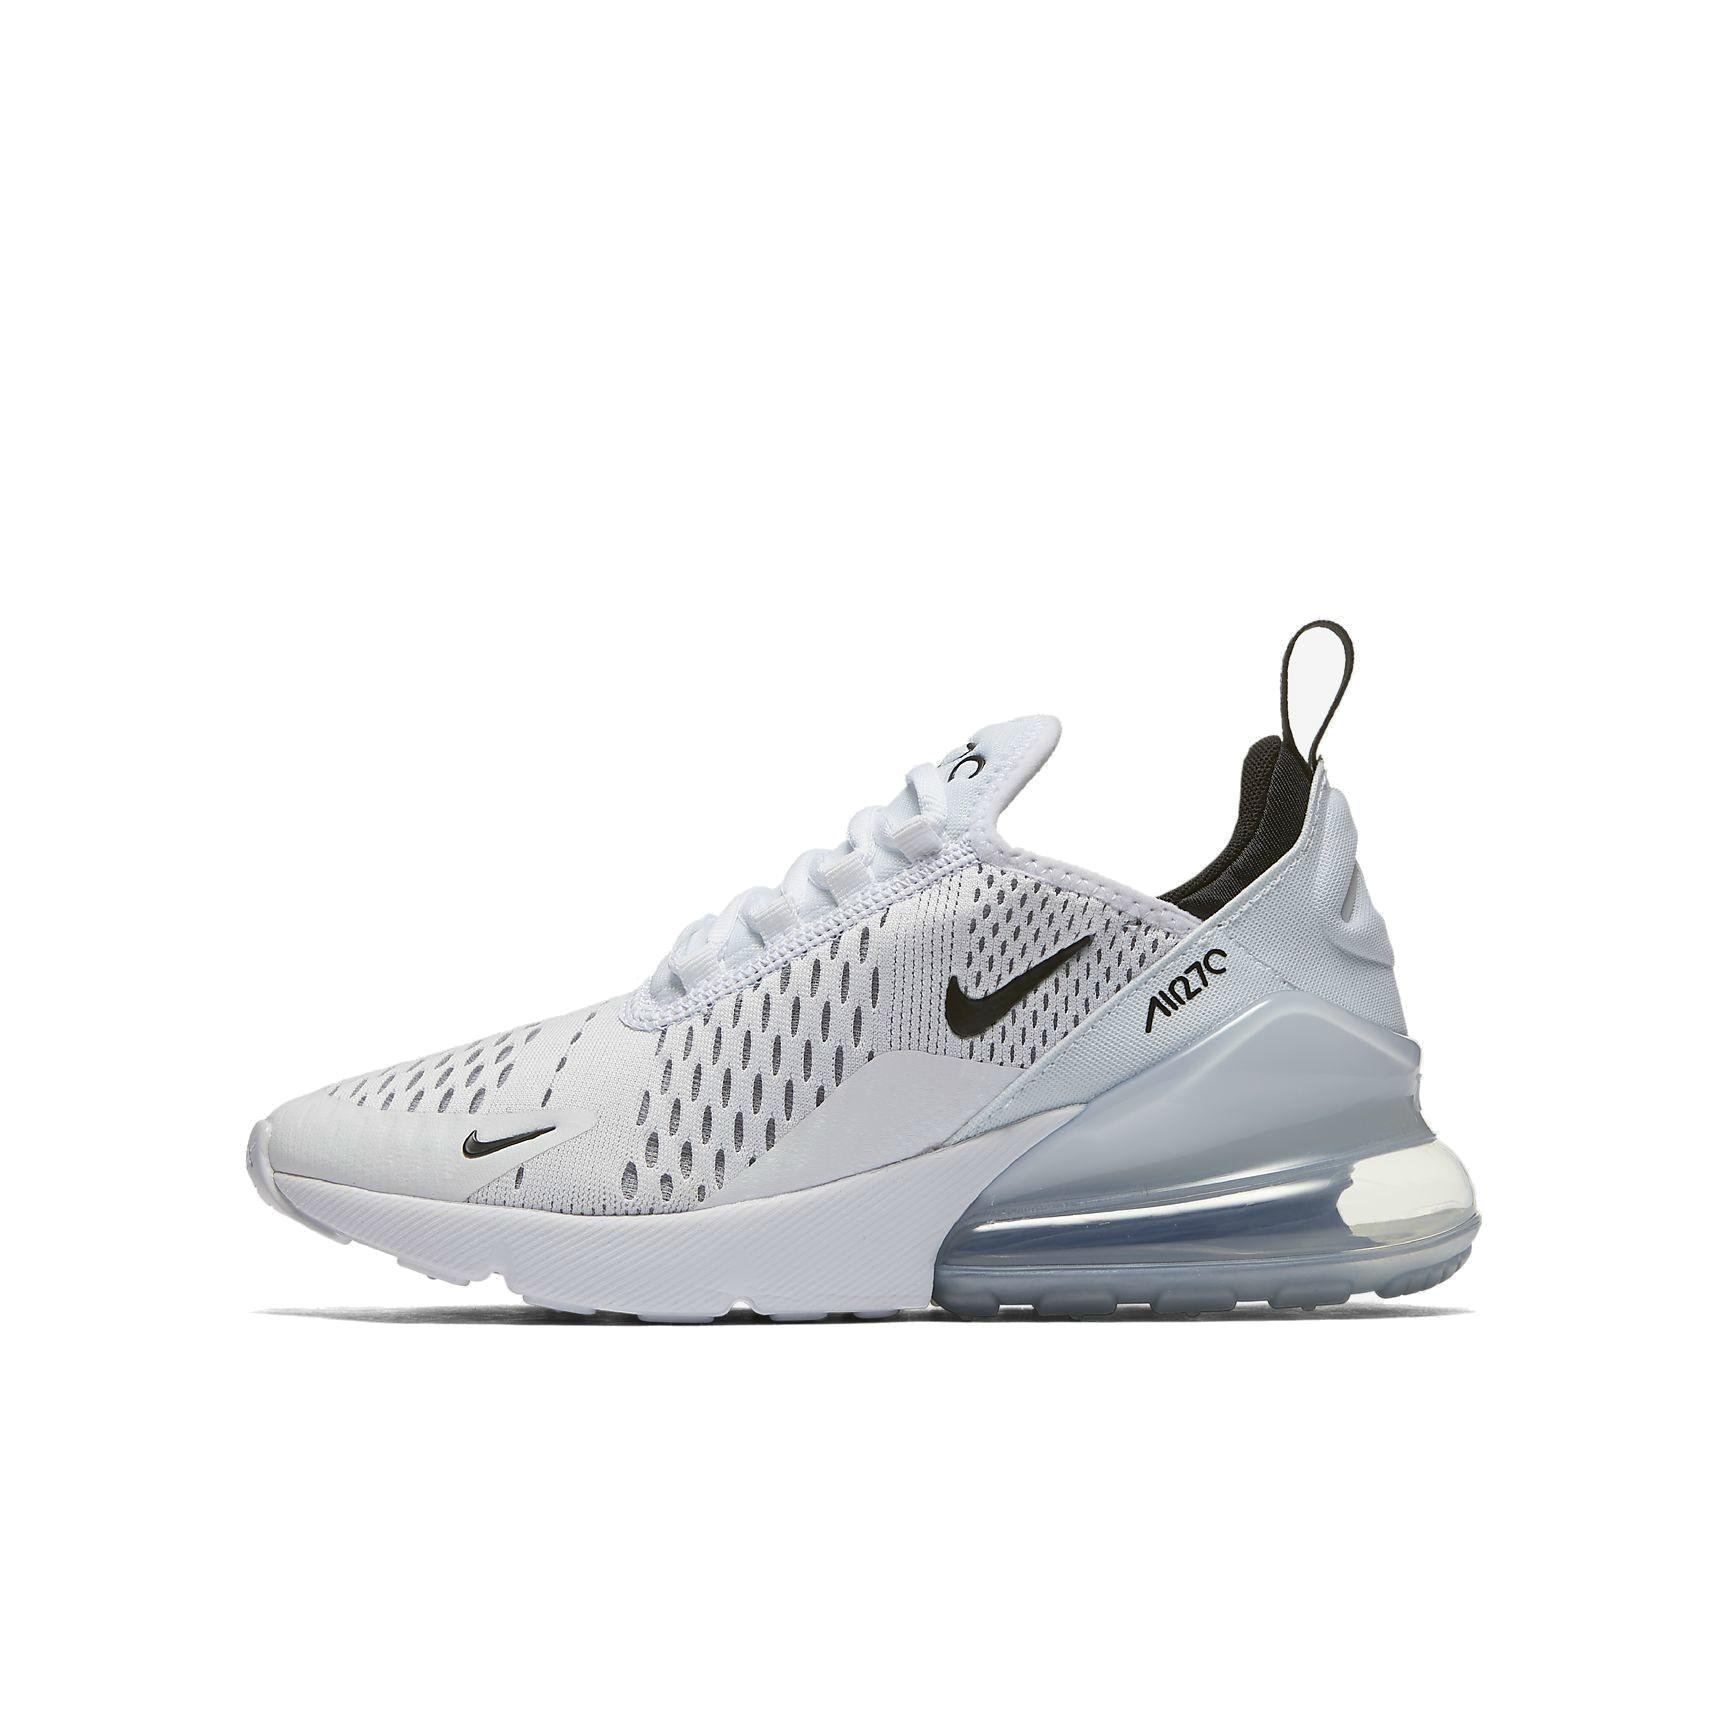 Nike Air Max 270 Big Kids' Running Shoes WhiteBlack White 943345 100 (6.5 M US)